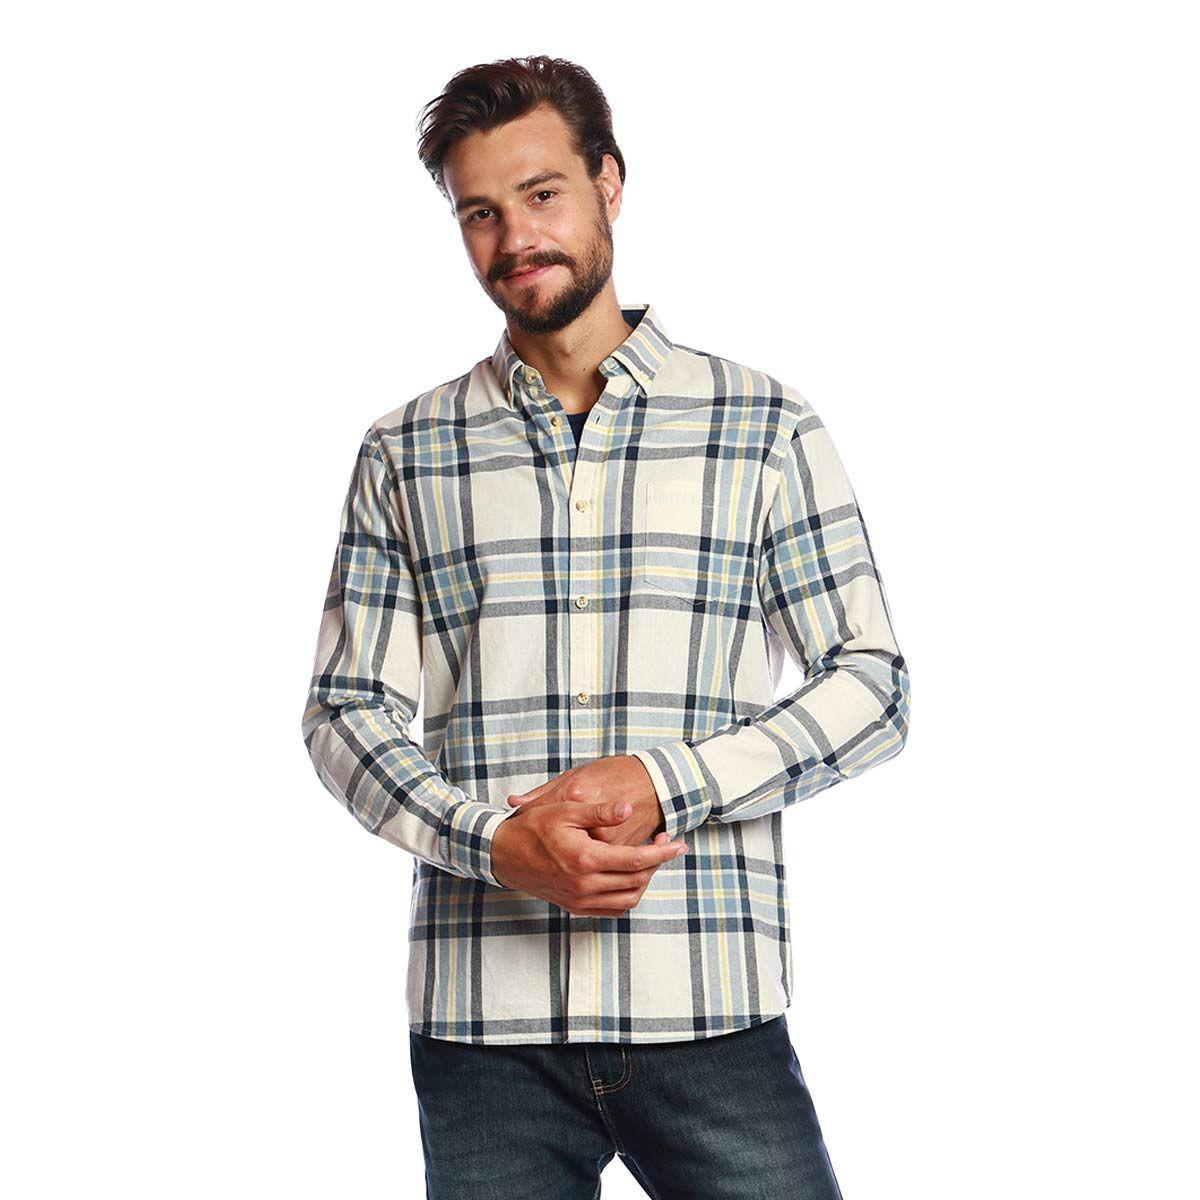 Camisa Manga Longa Xadrez com Textura  849bafd94005f